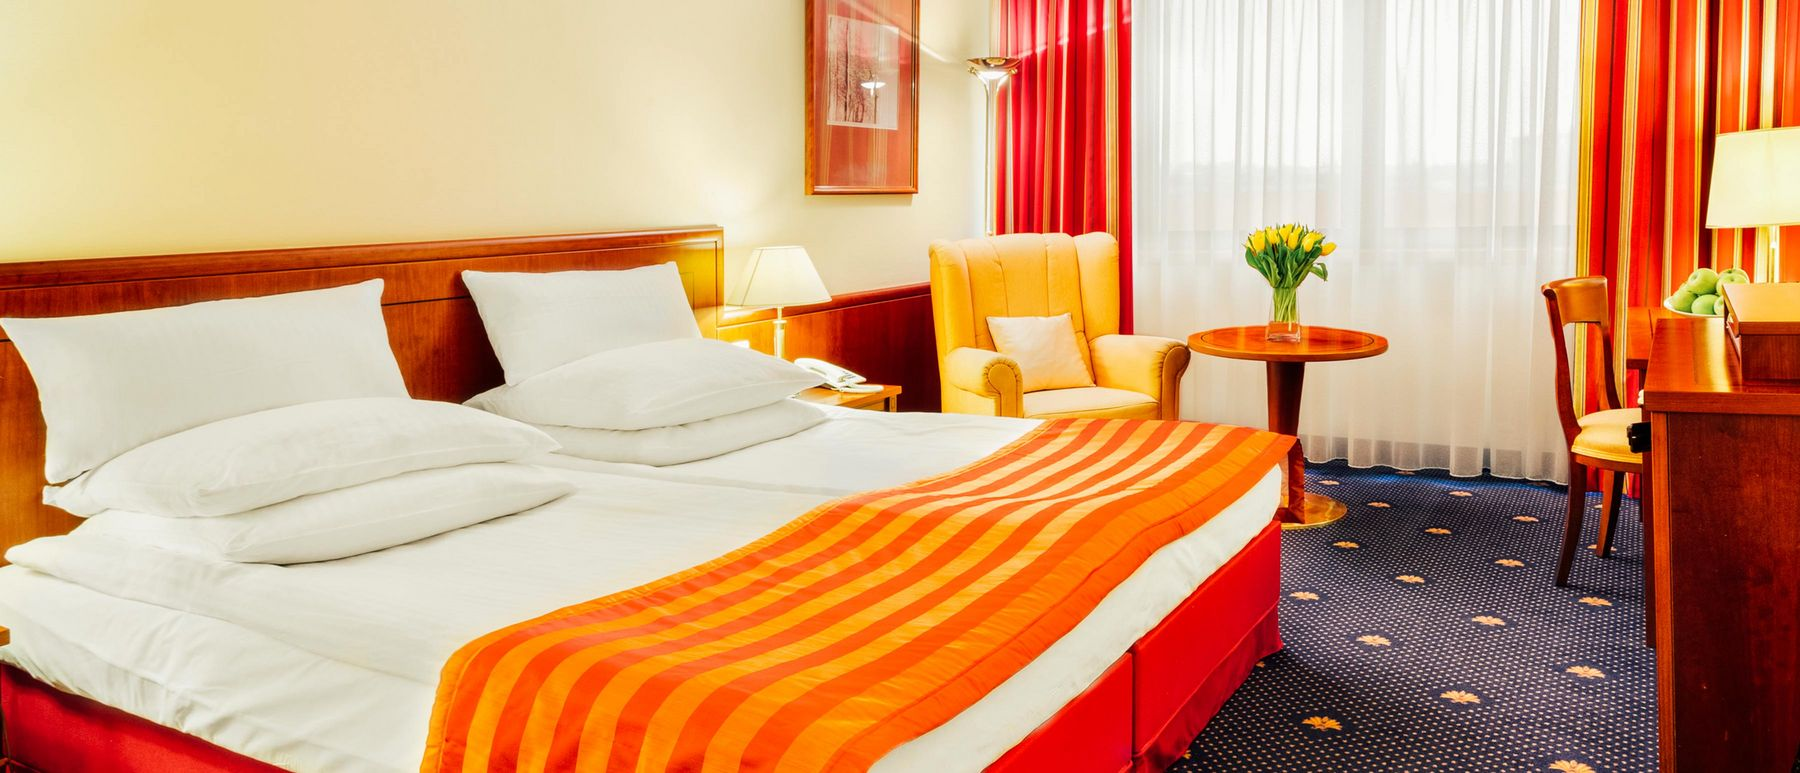 Hotel Vienna House Diplomat fotografie 2